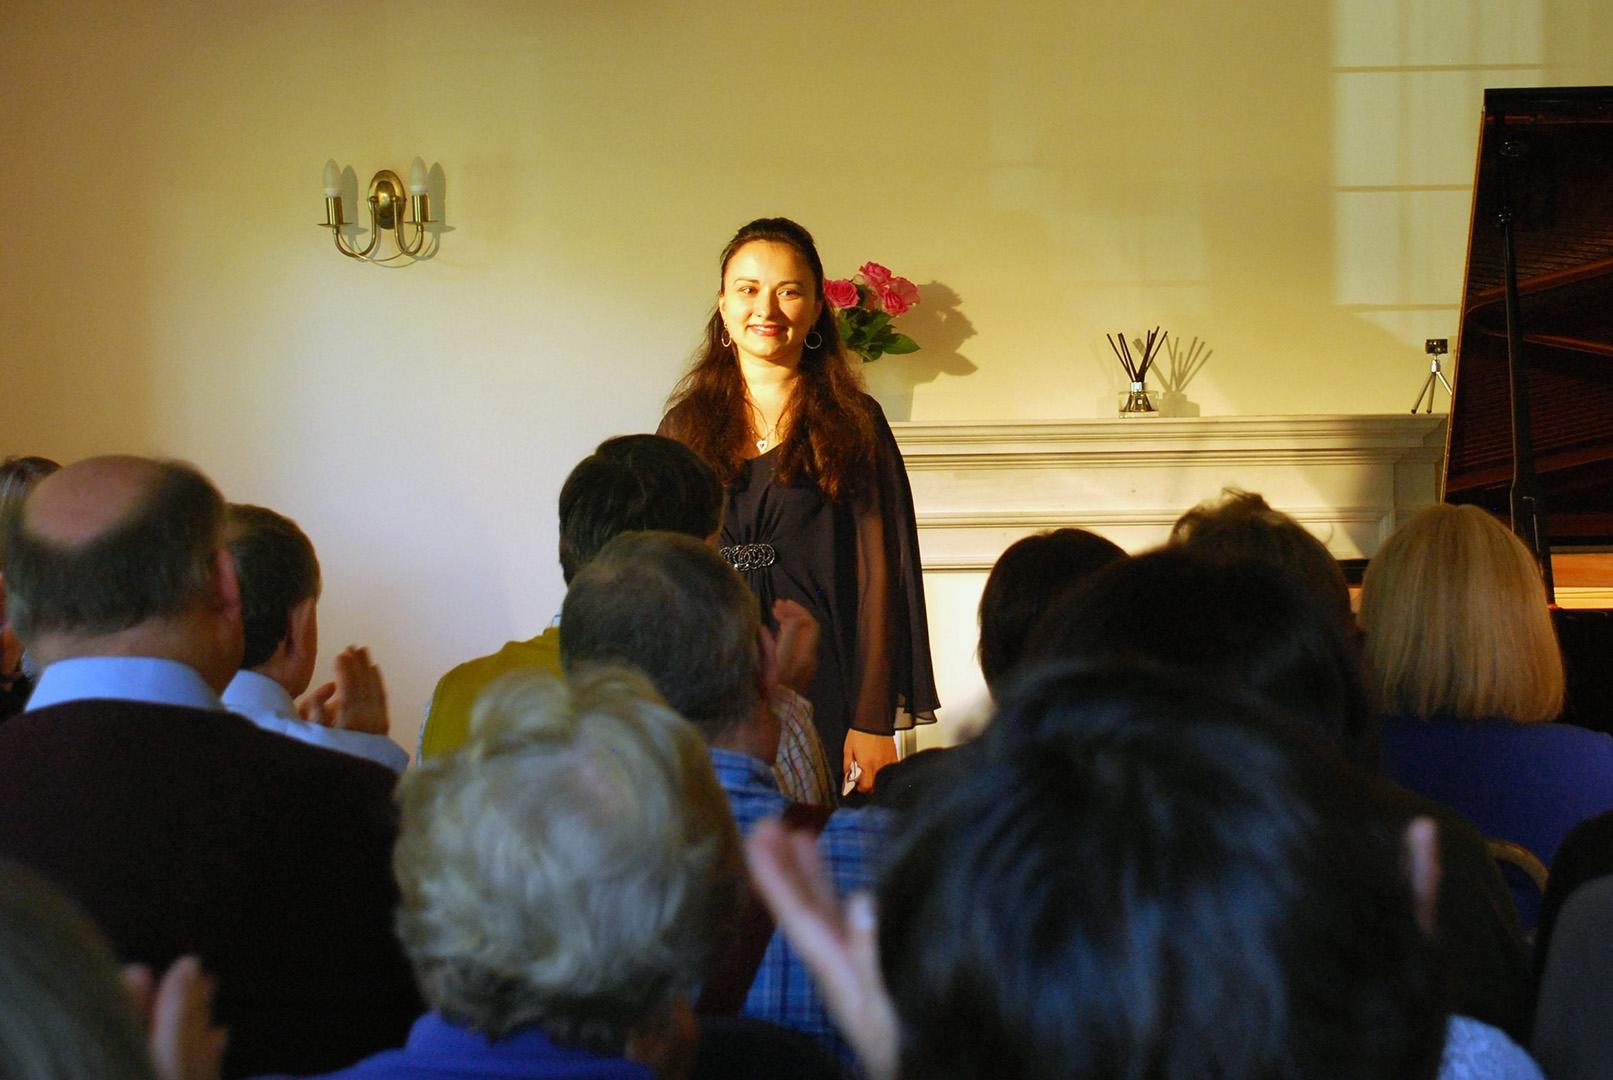 Dinara Klinton's matinee at Breinton on 13 October 2016